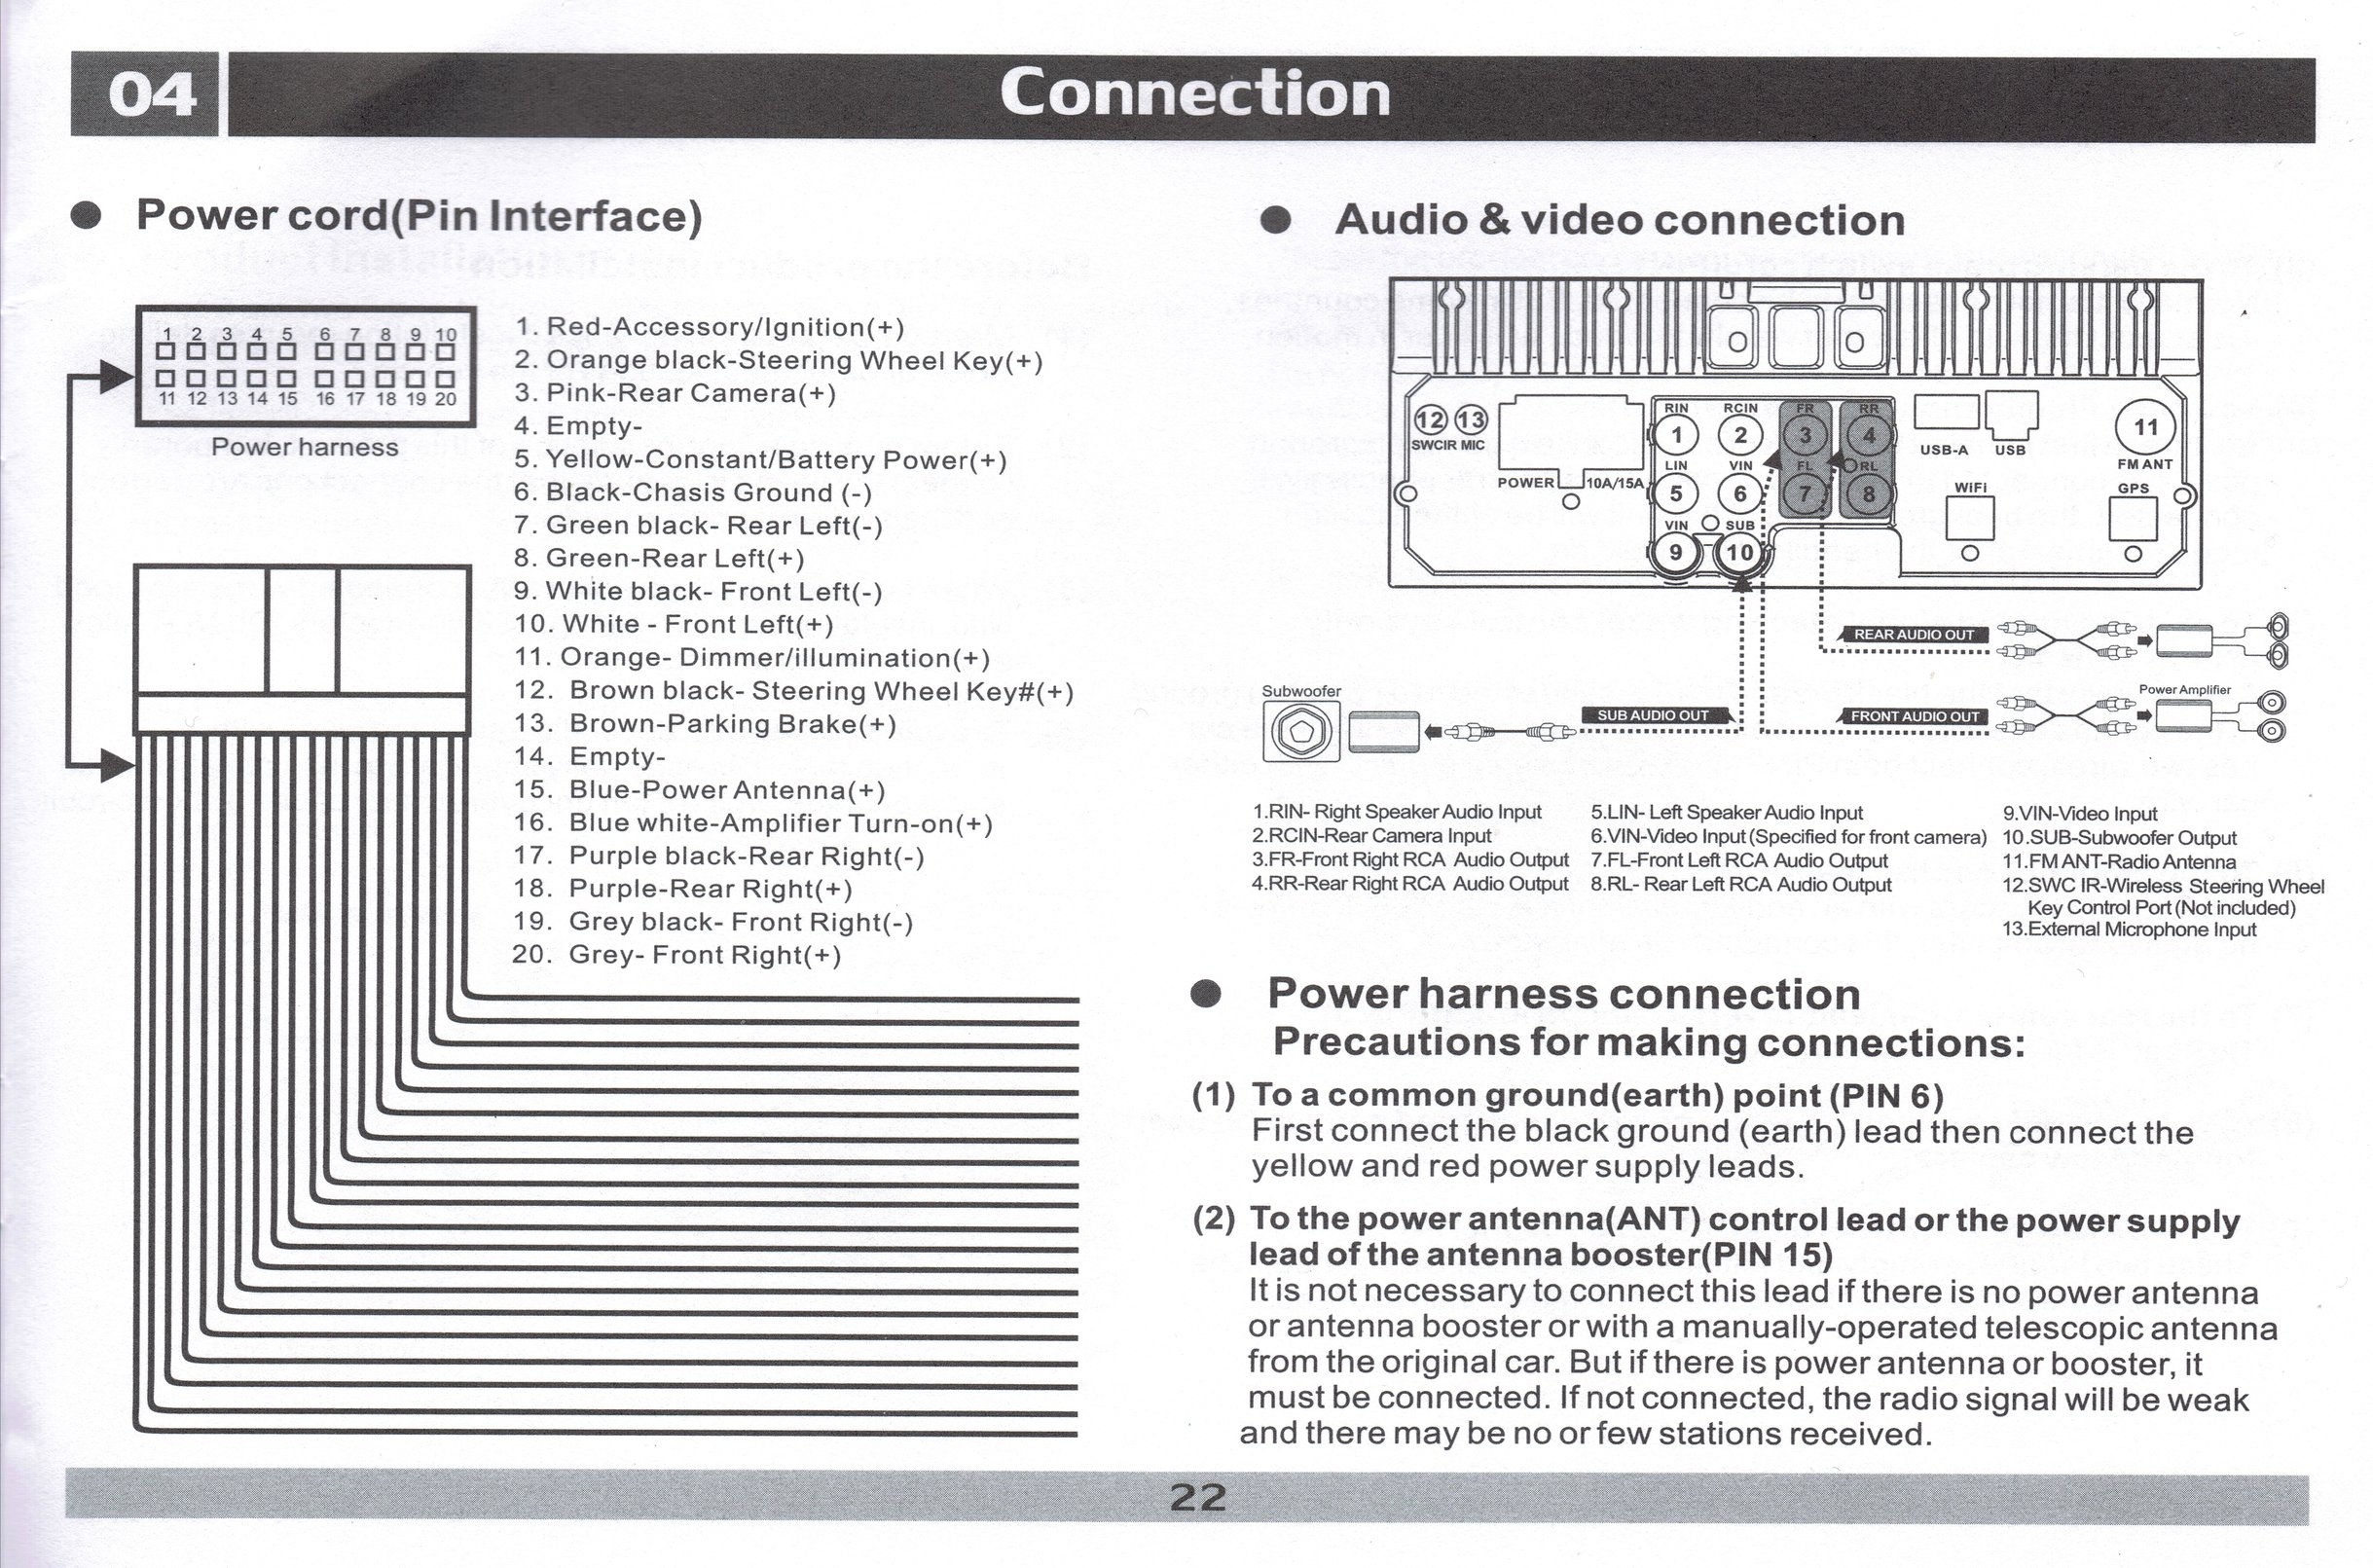 Wiring harness madness...   Nissan Frontier ForumNissan Frontier Forum